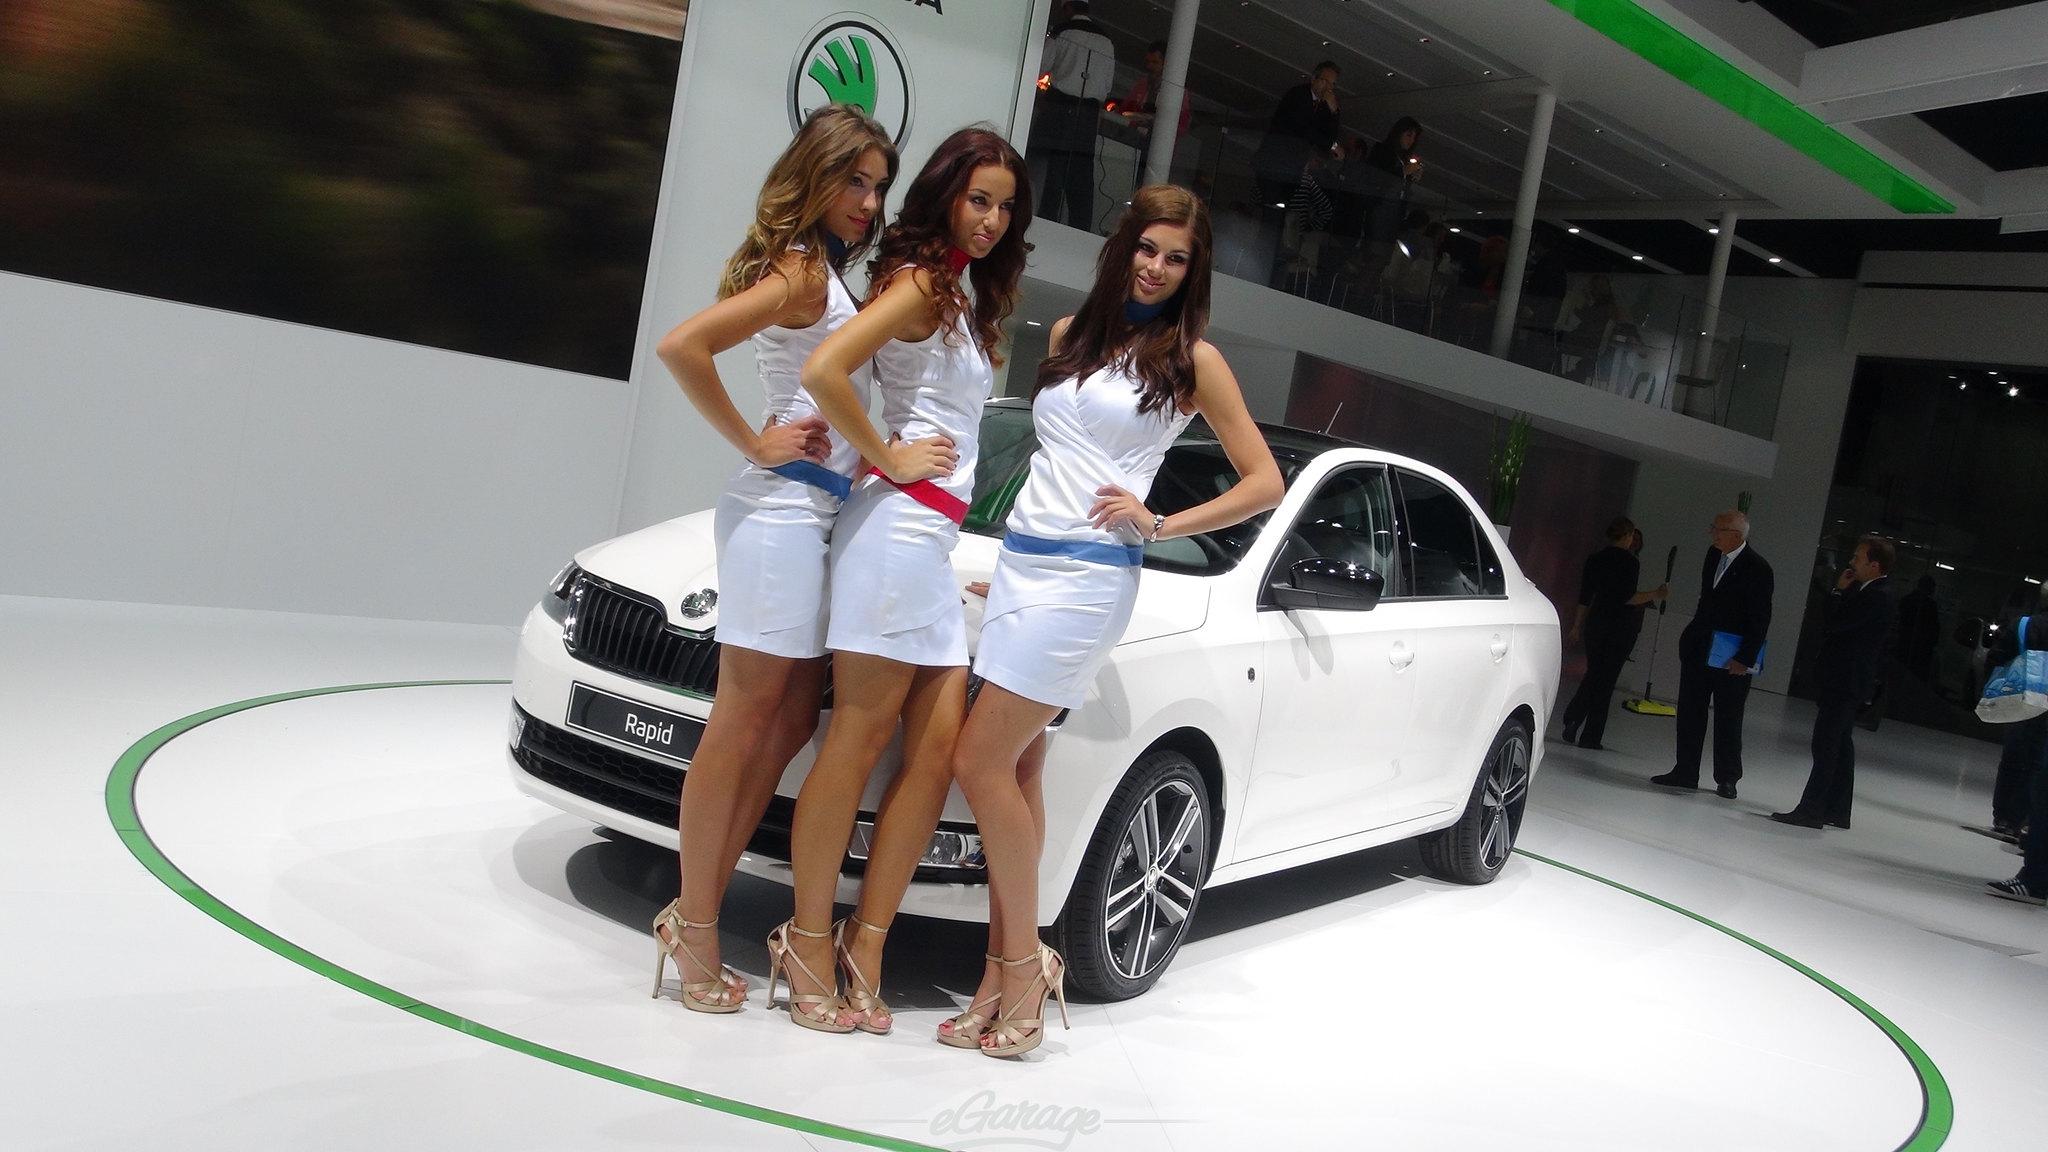 8030422300 bddbae3ae8 k 2012 Paris Motor Show